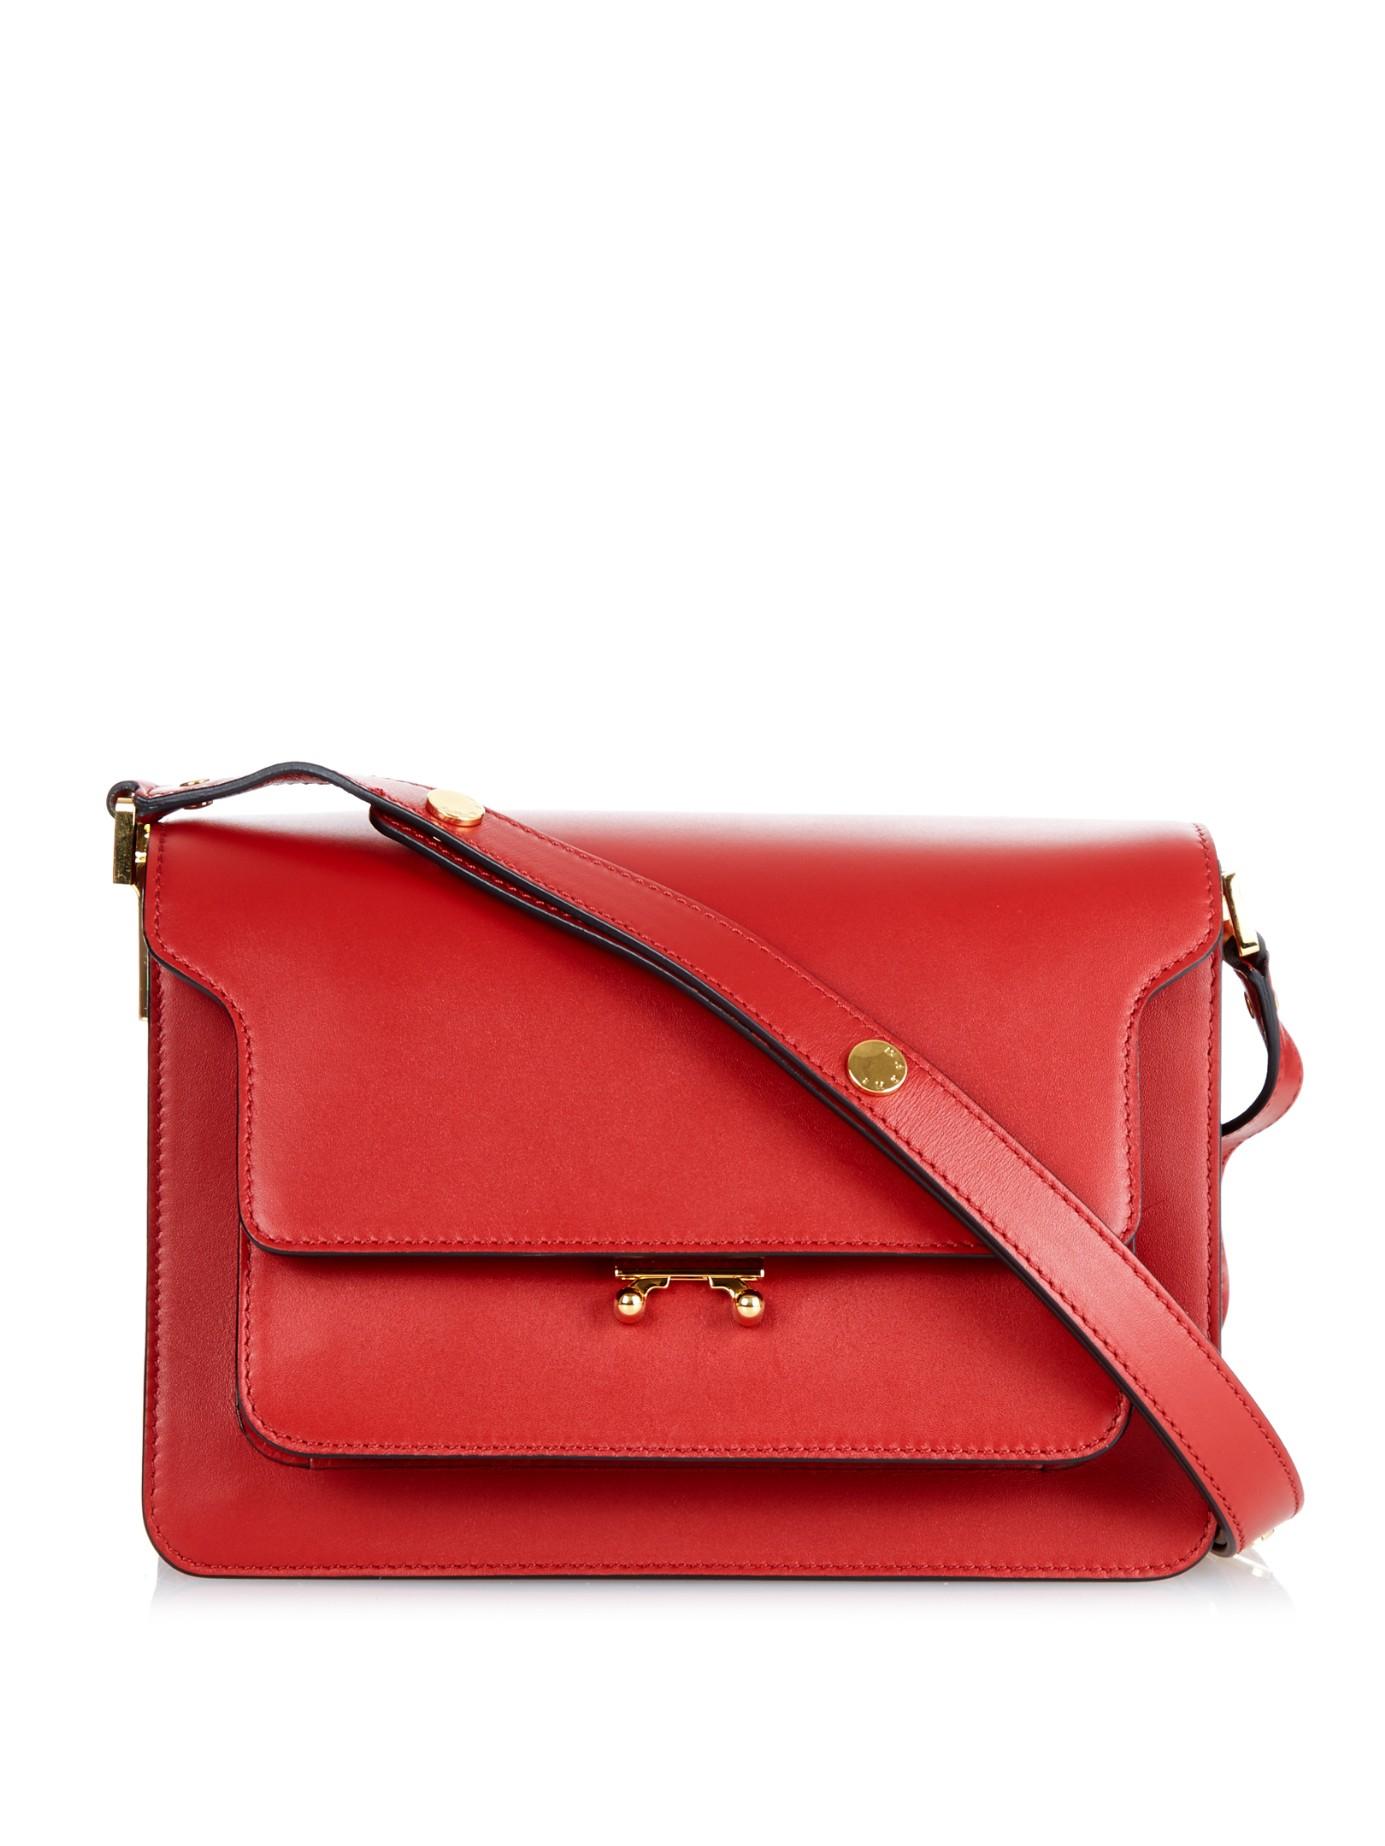 micro trunk shoulder bag - Red Marni For Nice Cheap Price Clearance Very Cheap Buy Cheap Big Sale XL5Q9ShJX